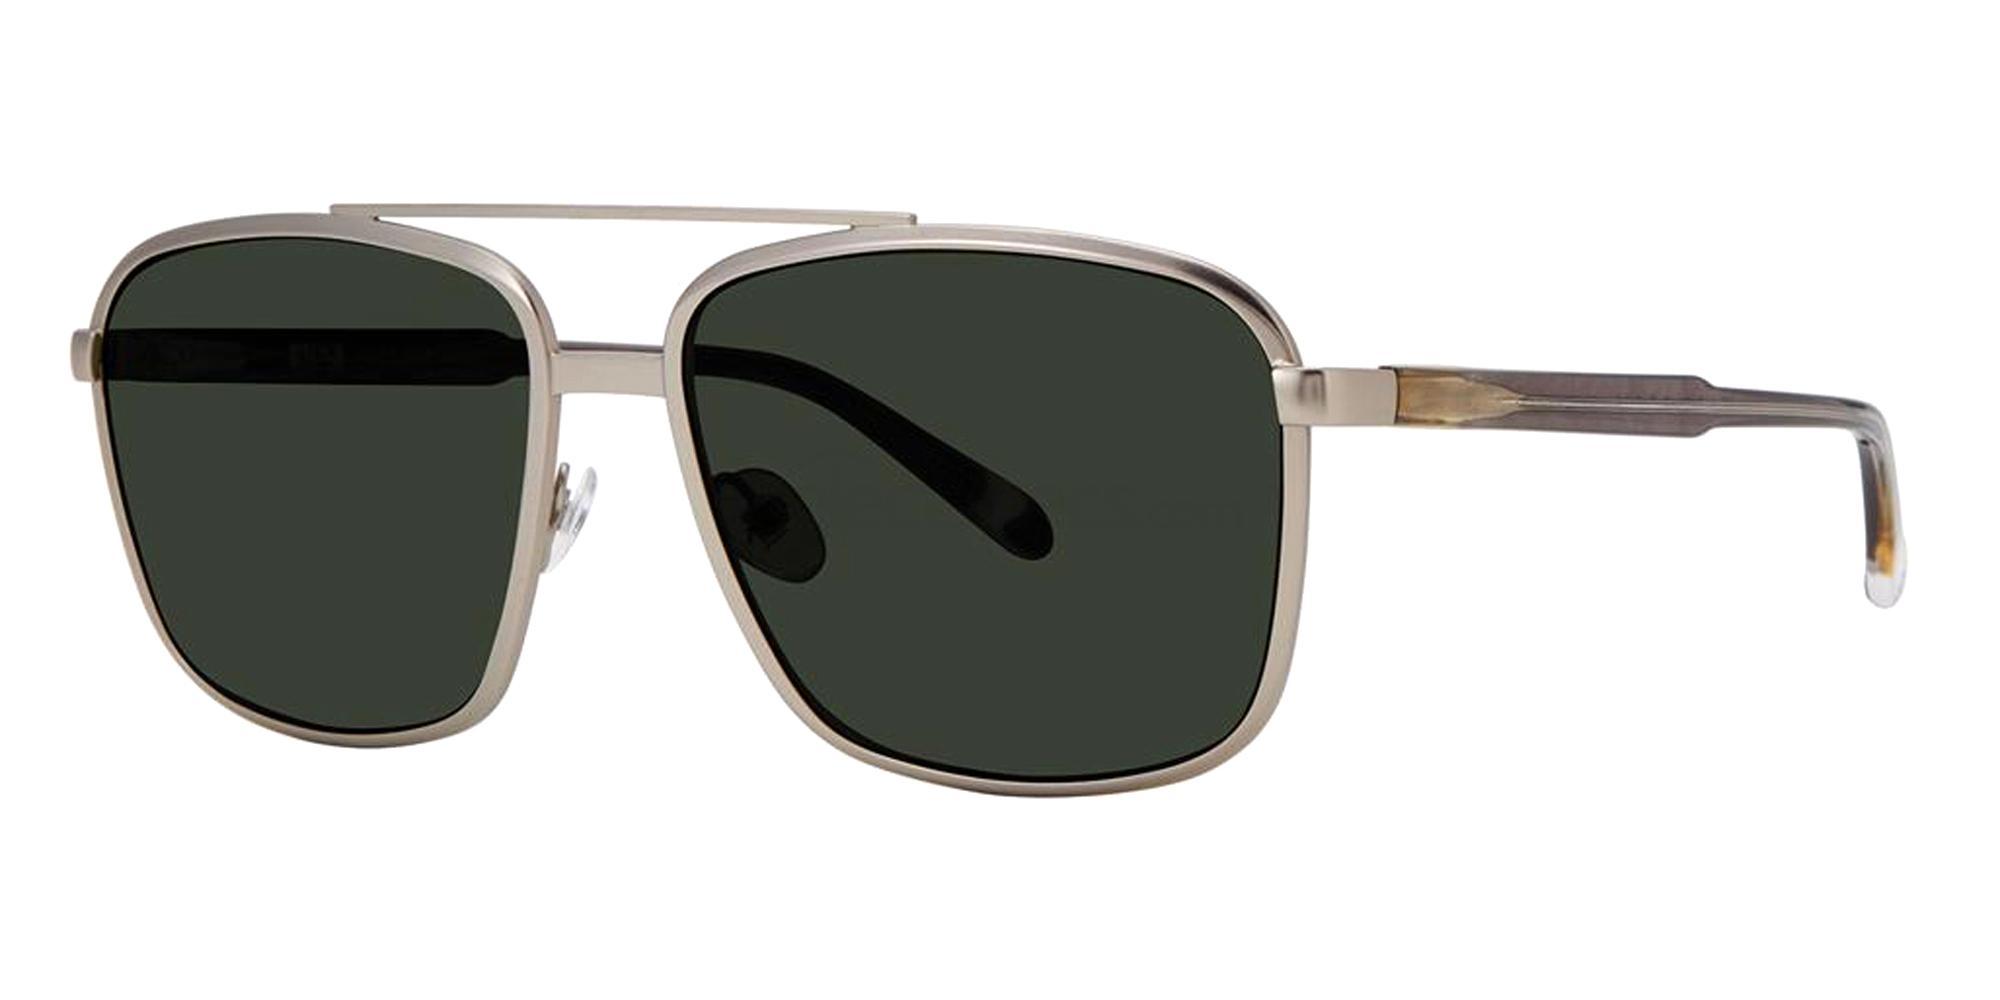 Gunmetal THE EARL 2.0 S Sunglasses, Original Penguin